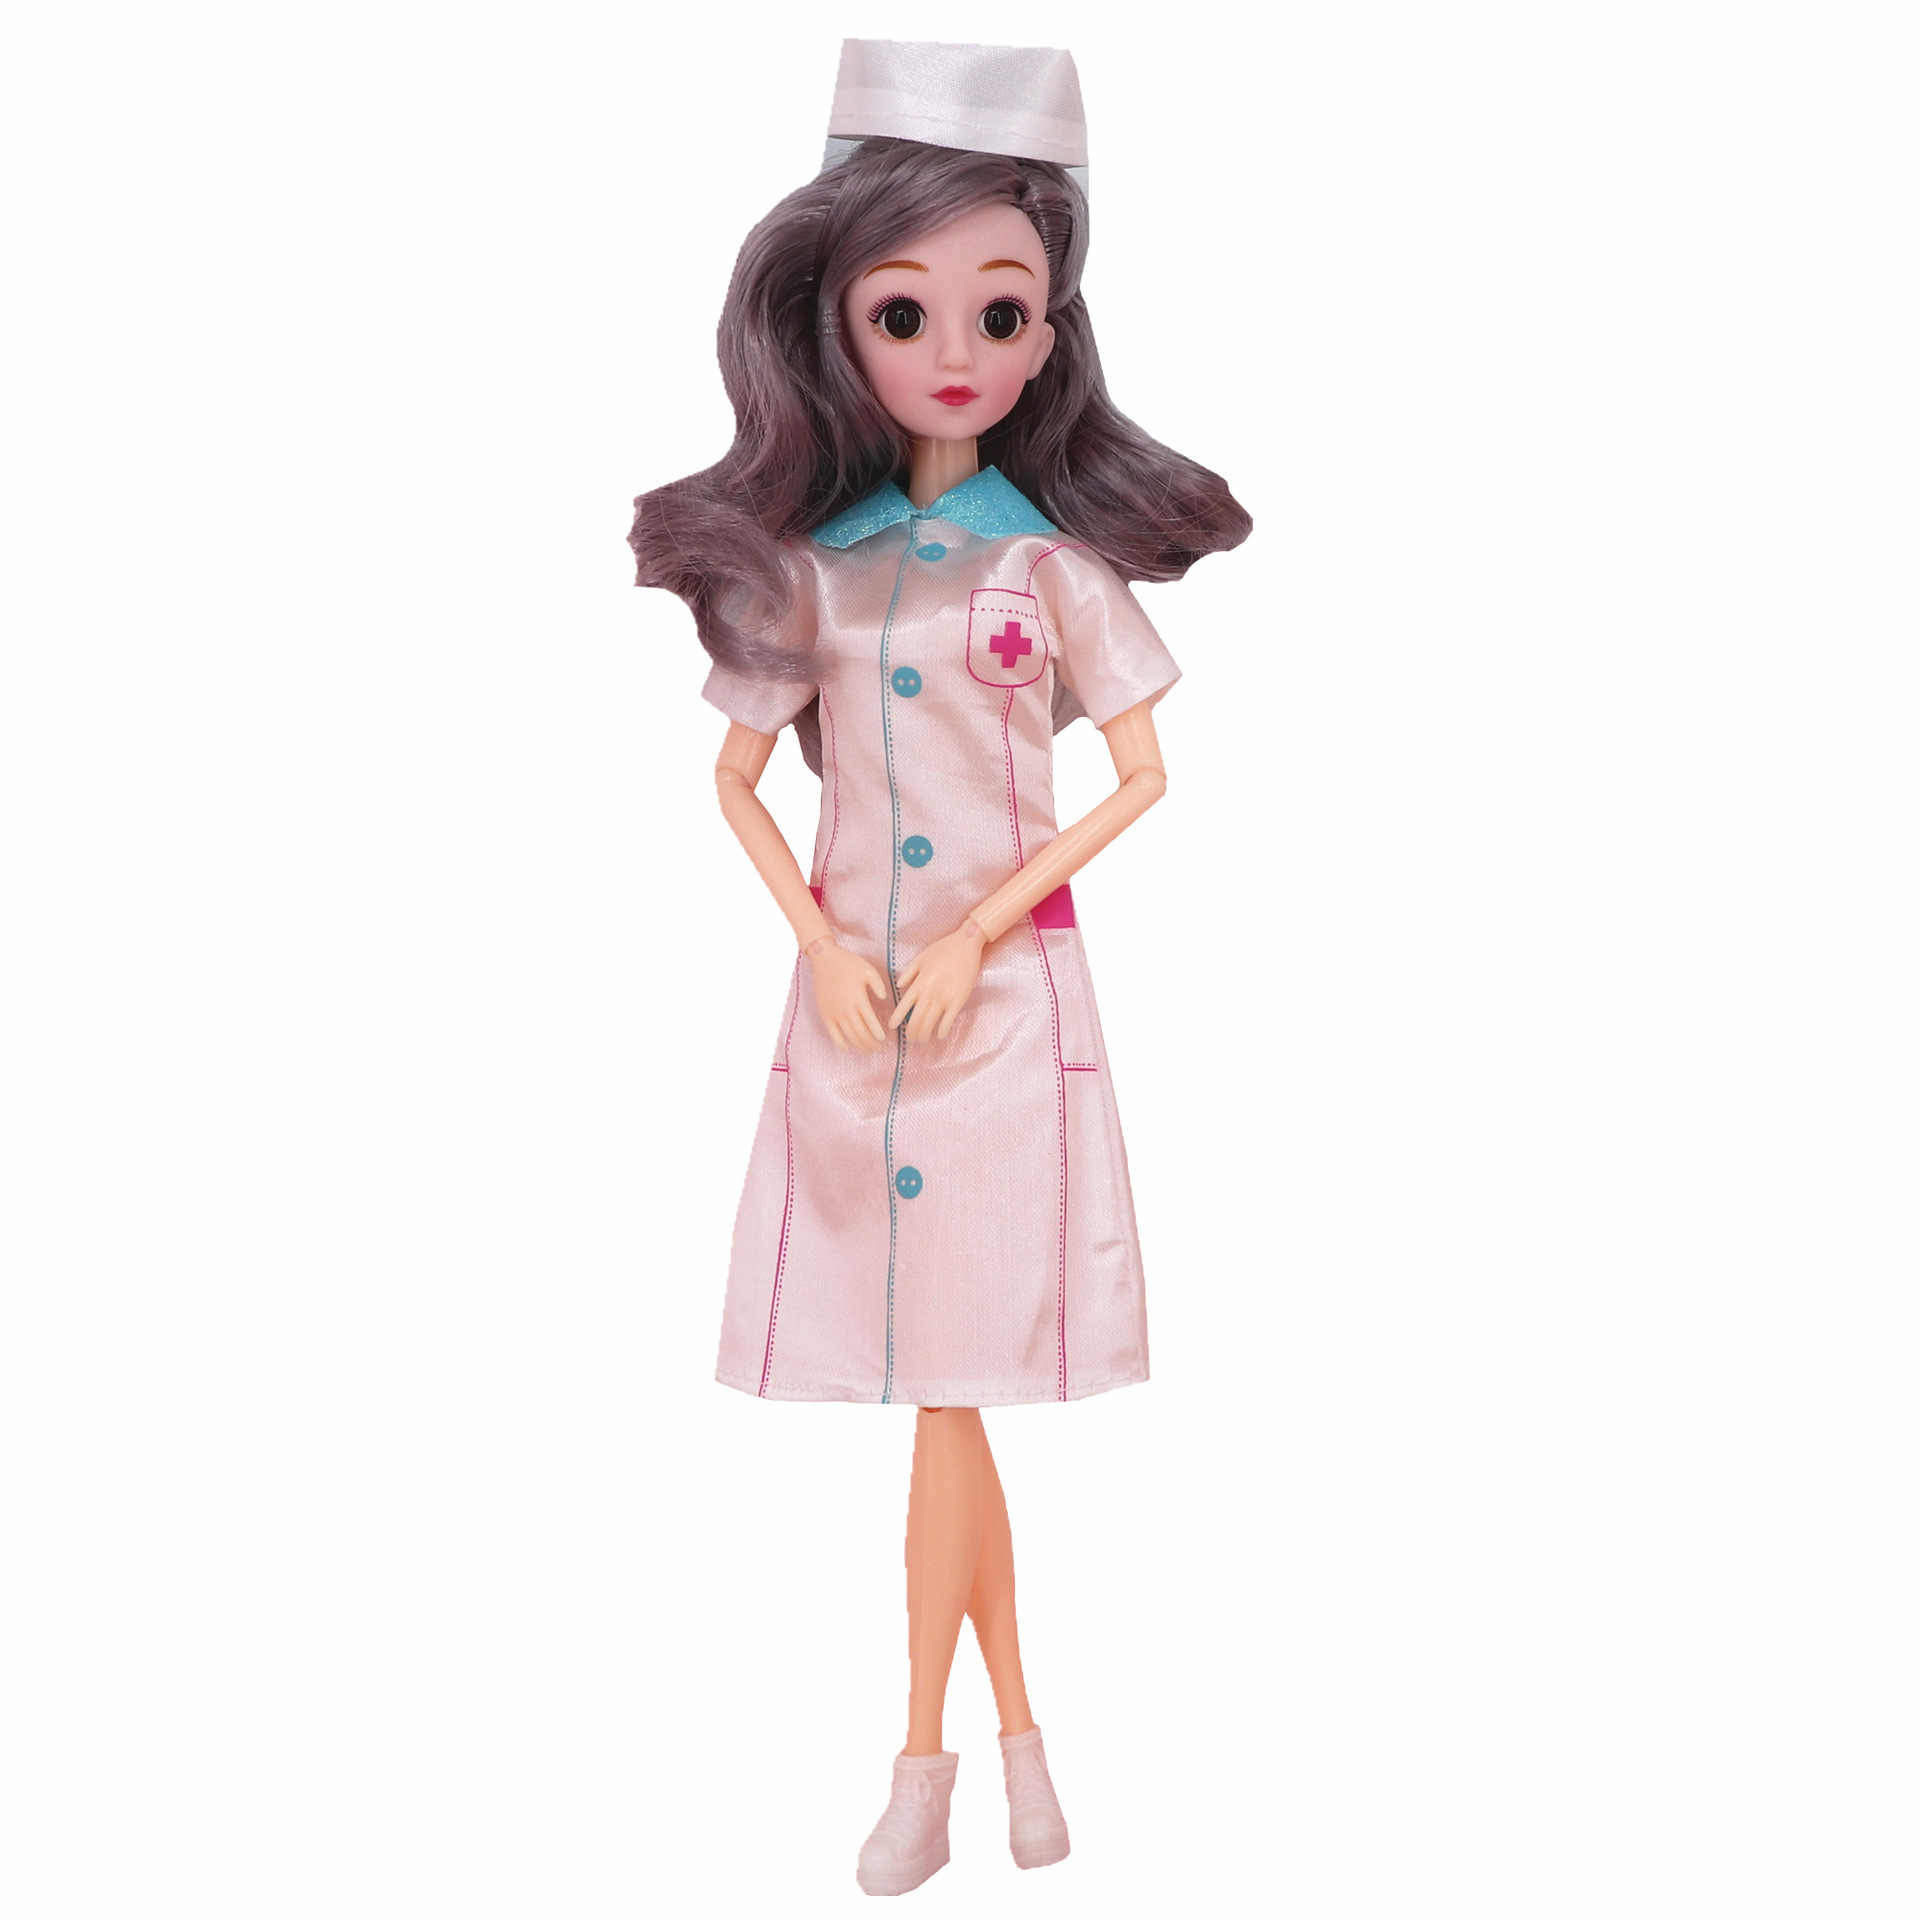 Nk 2 set/lote boneca brinquedos moda roupas uniforme + chapéu anjo branco feminino enfermeira vestir-se brinquedos para boneca barbie cosplay